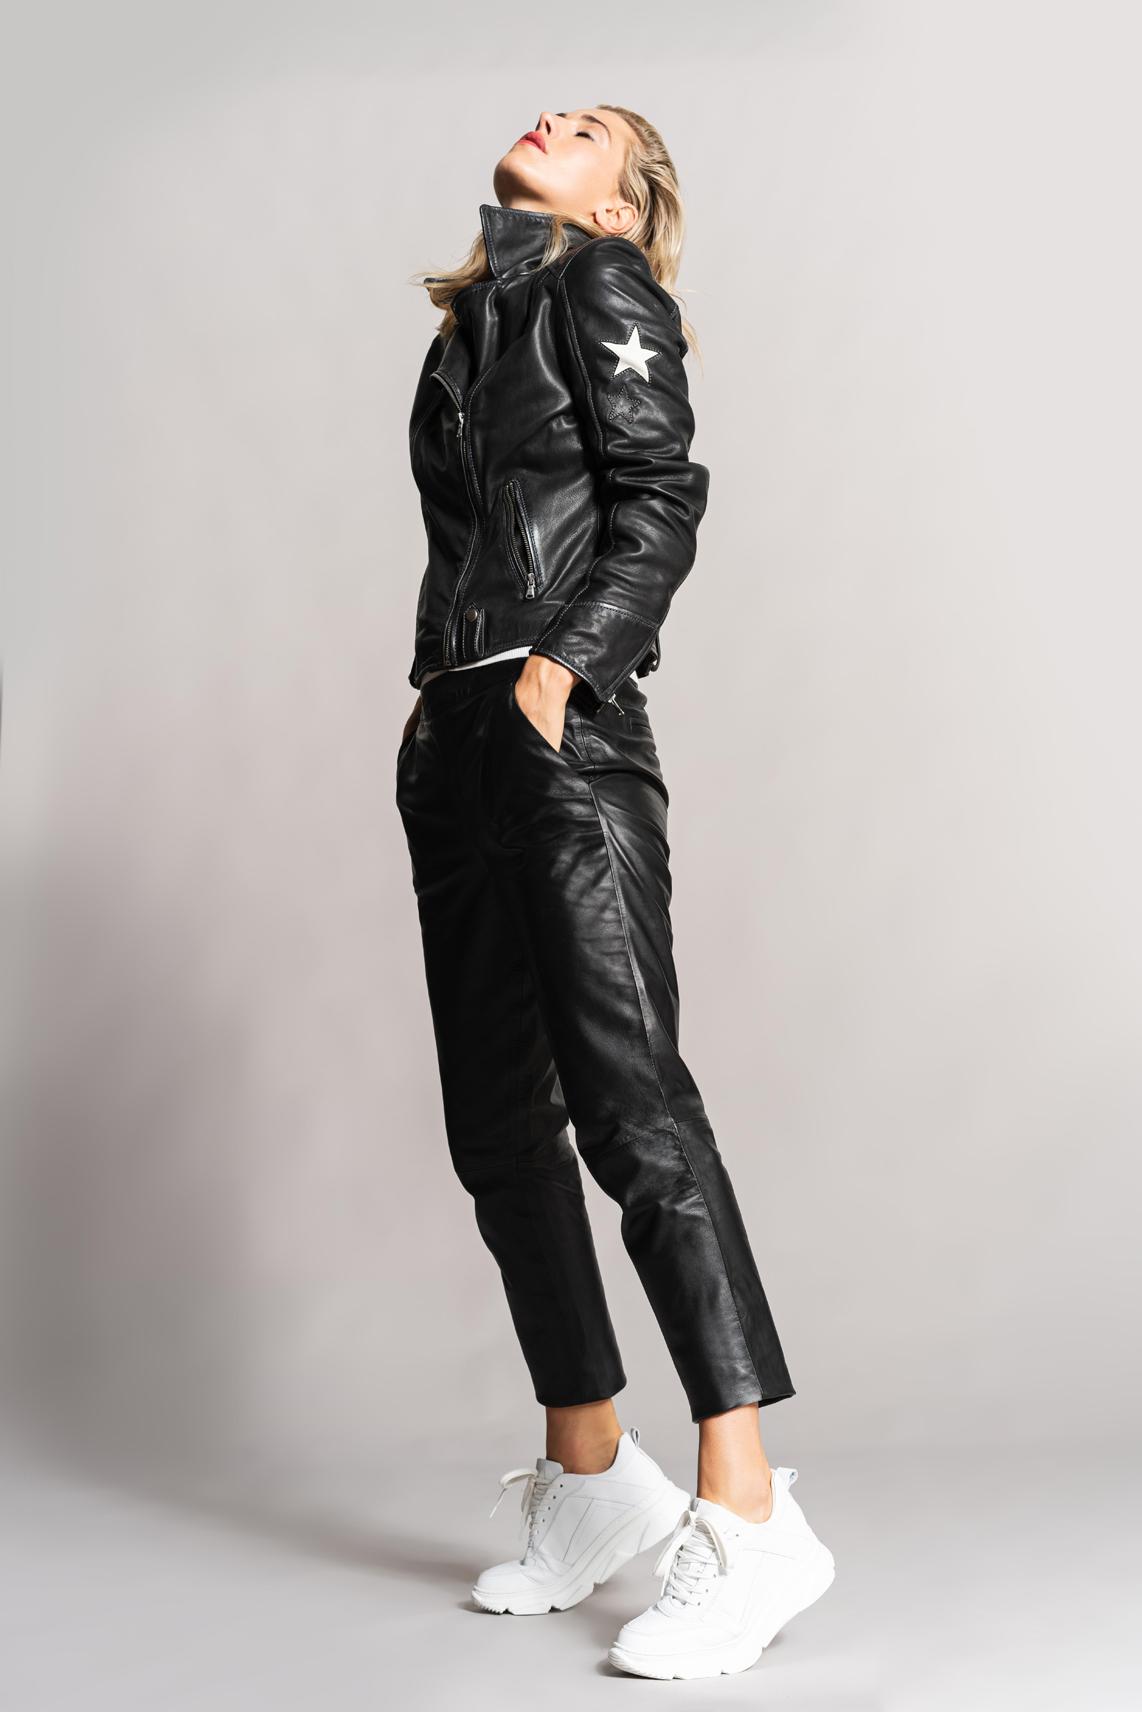 Anna Dames Leren broek zwart